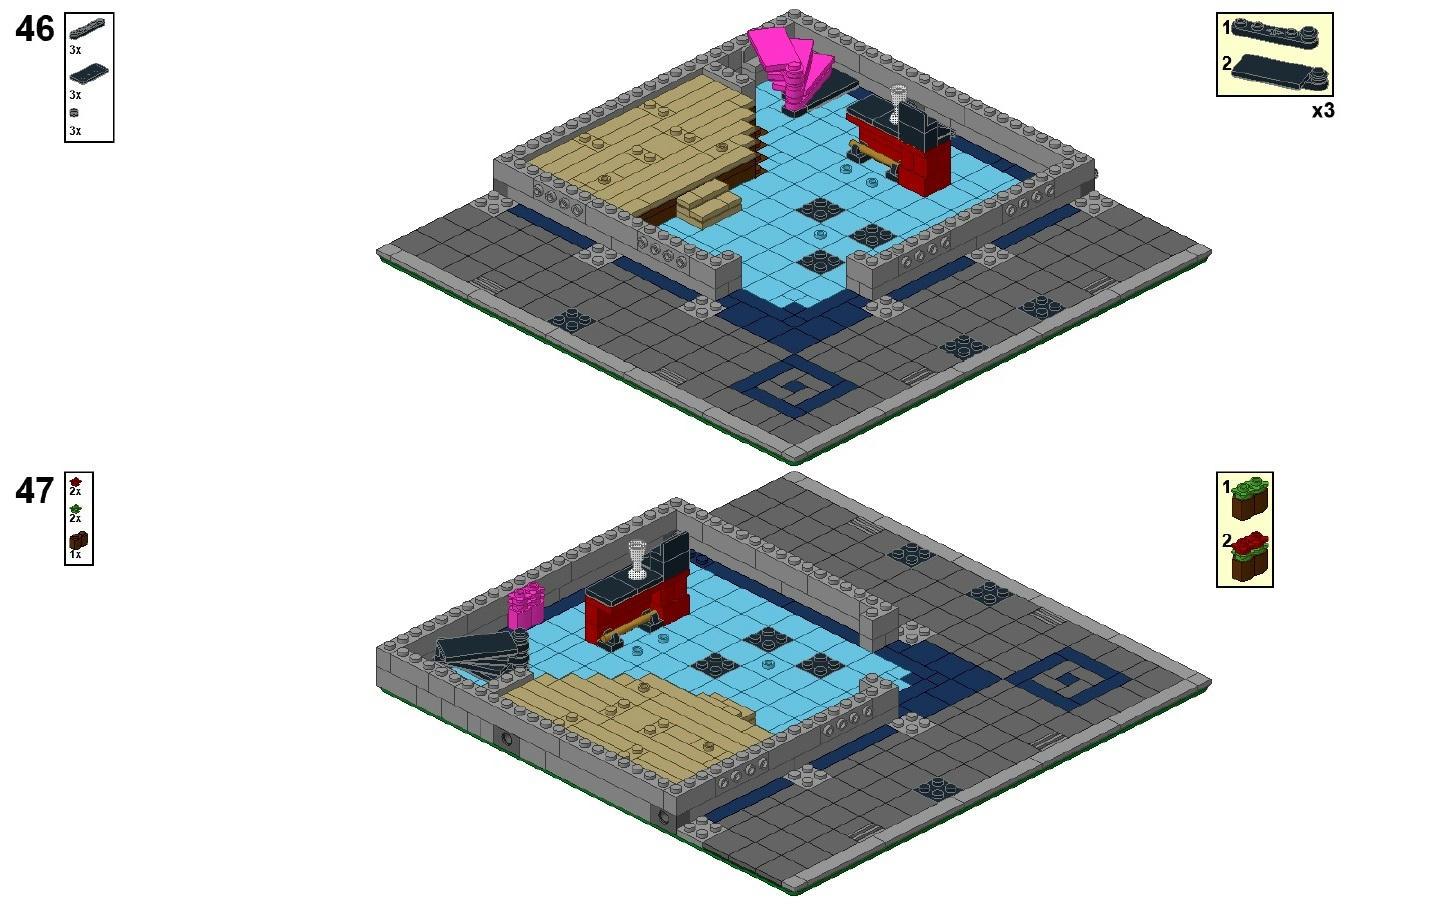 lego custom modular instructions